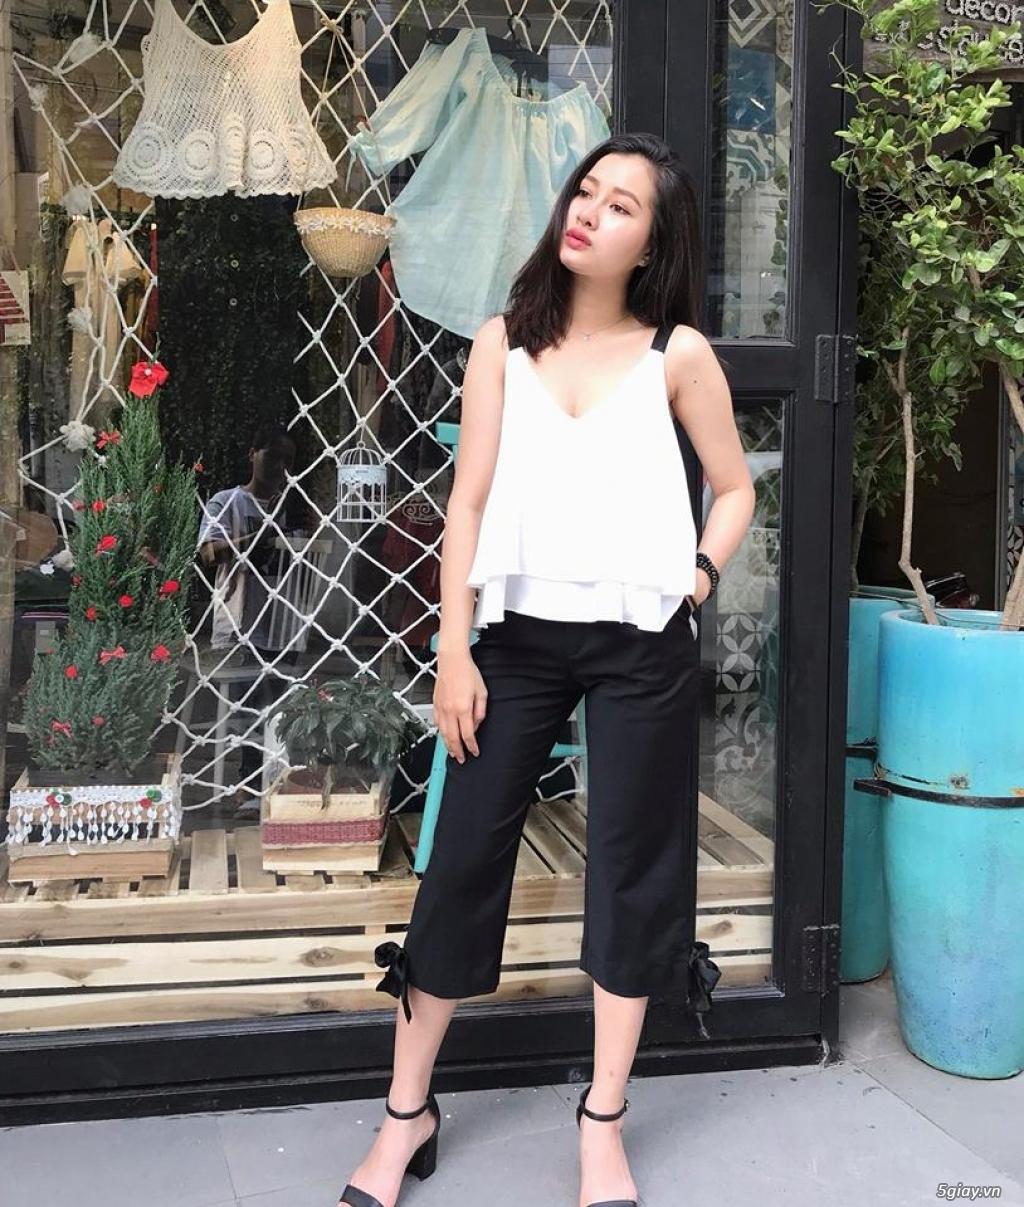 Shop Thời Trang Trực Tuyến (instagram.com/shopthoitrangtructuyen) - 17